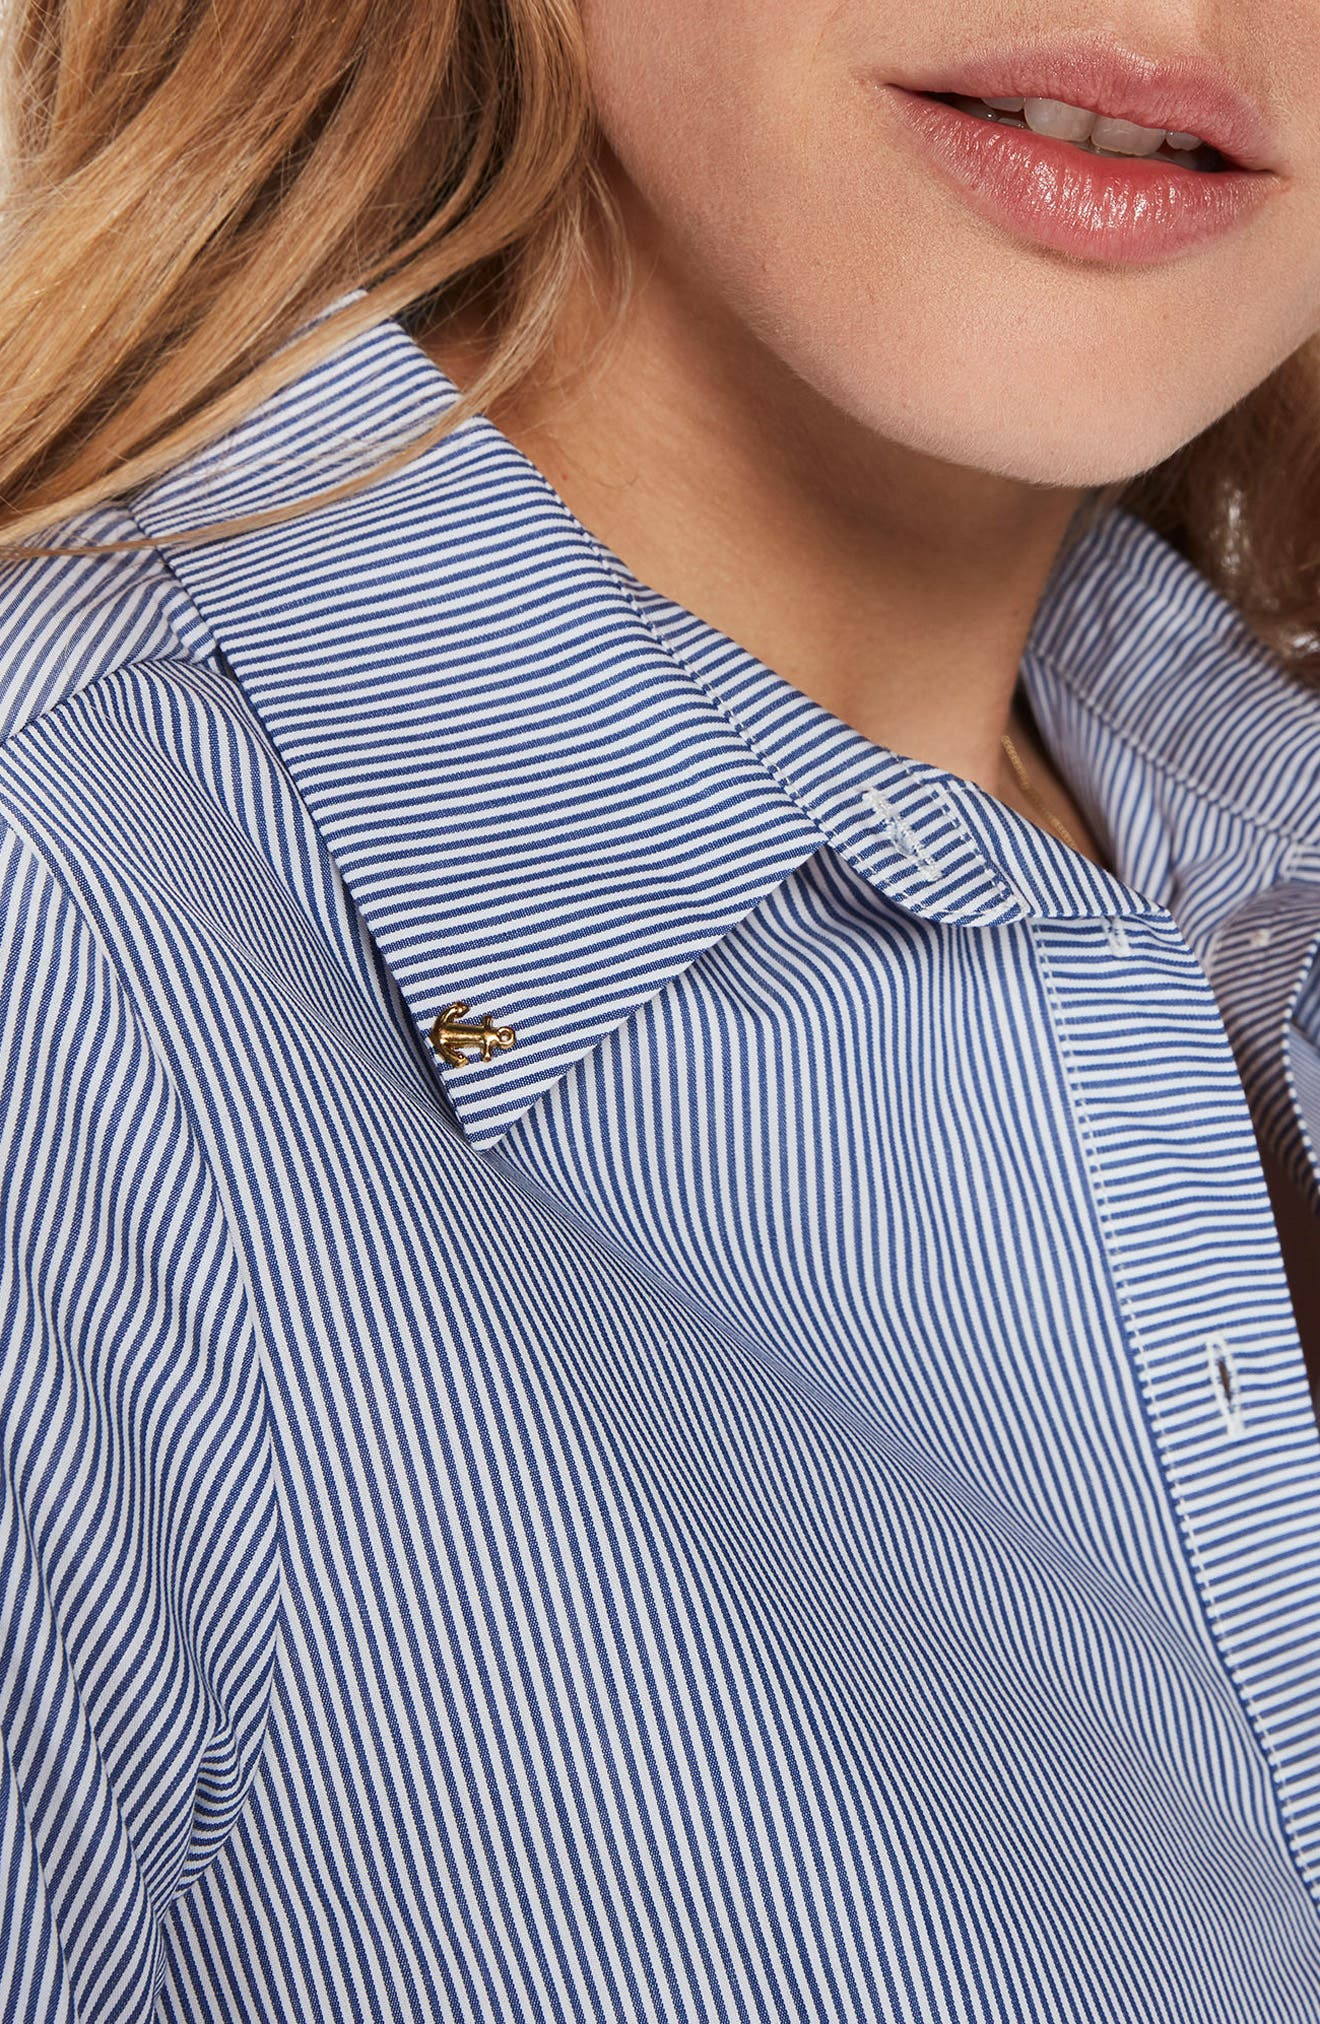 Bell Sleeve Shirt,                             Alternate thumbnail 3, color,